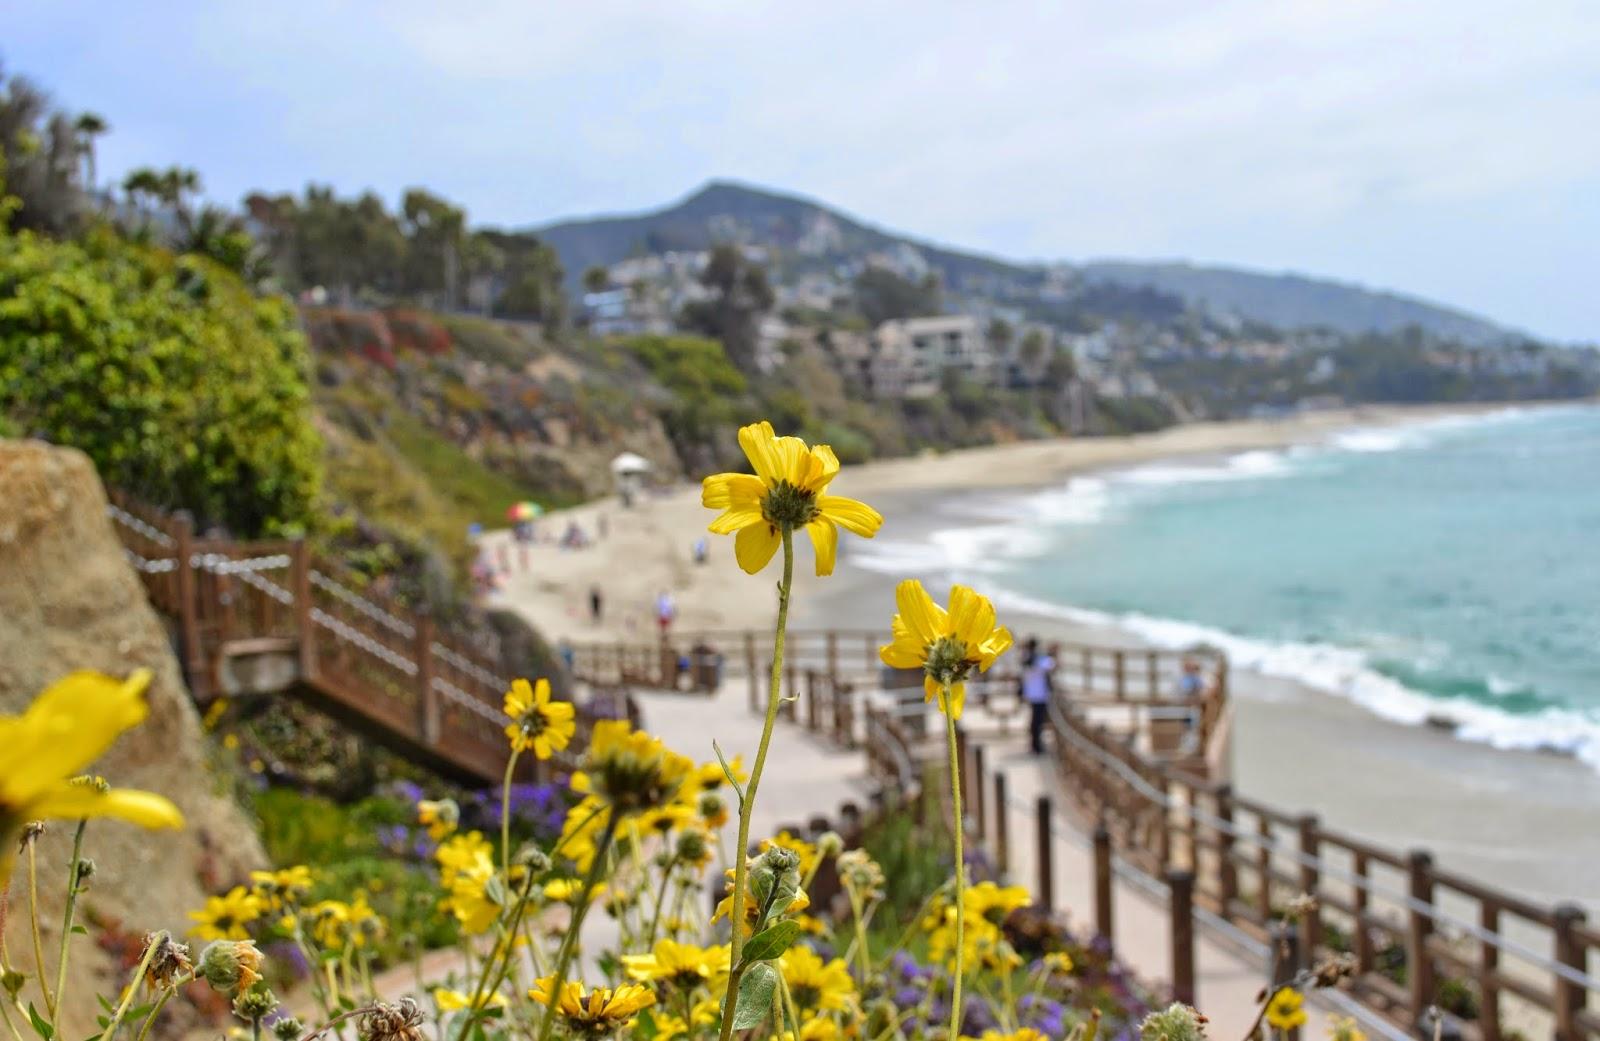 Mash Elle beauty blogger travels to Laguna Beach | what to do in Laguna beach | California travel | trip to California | Laguna Hills